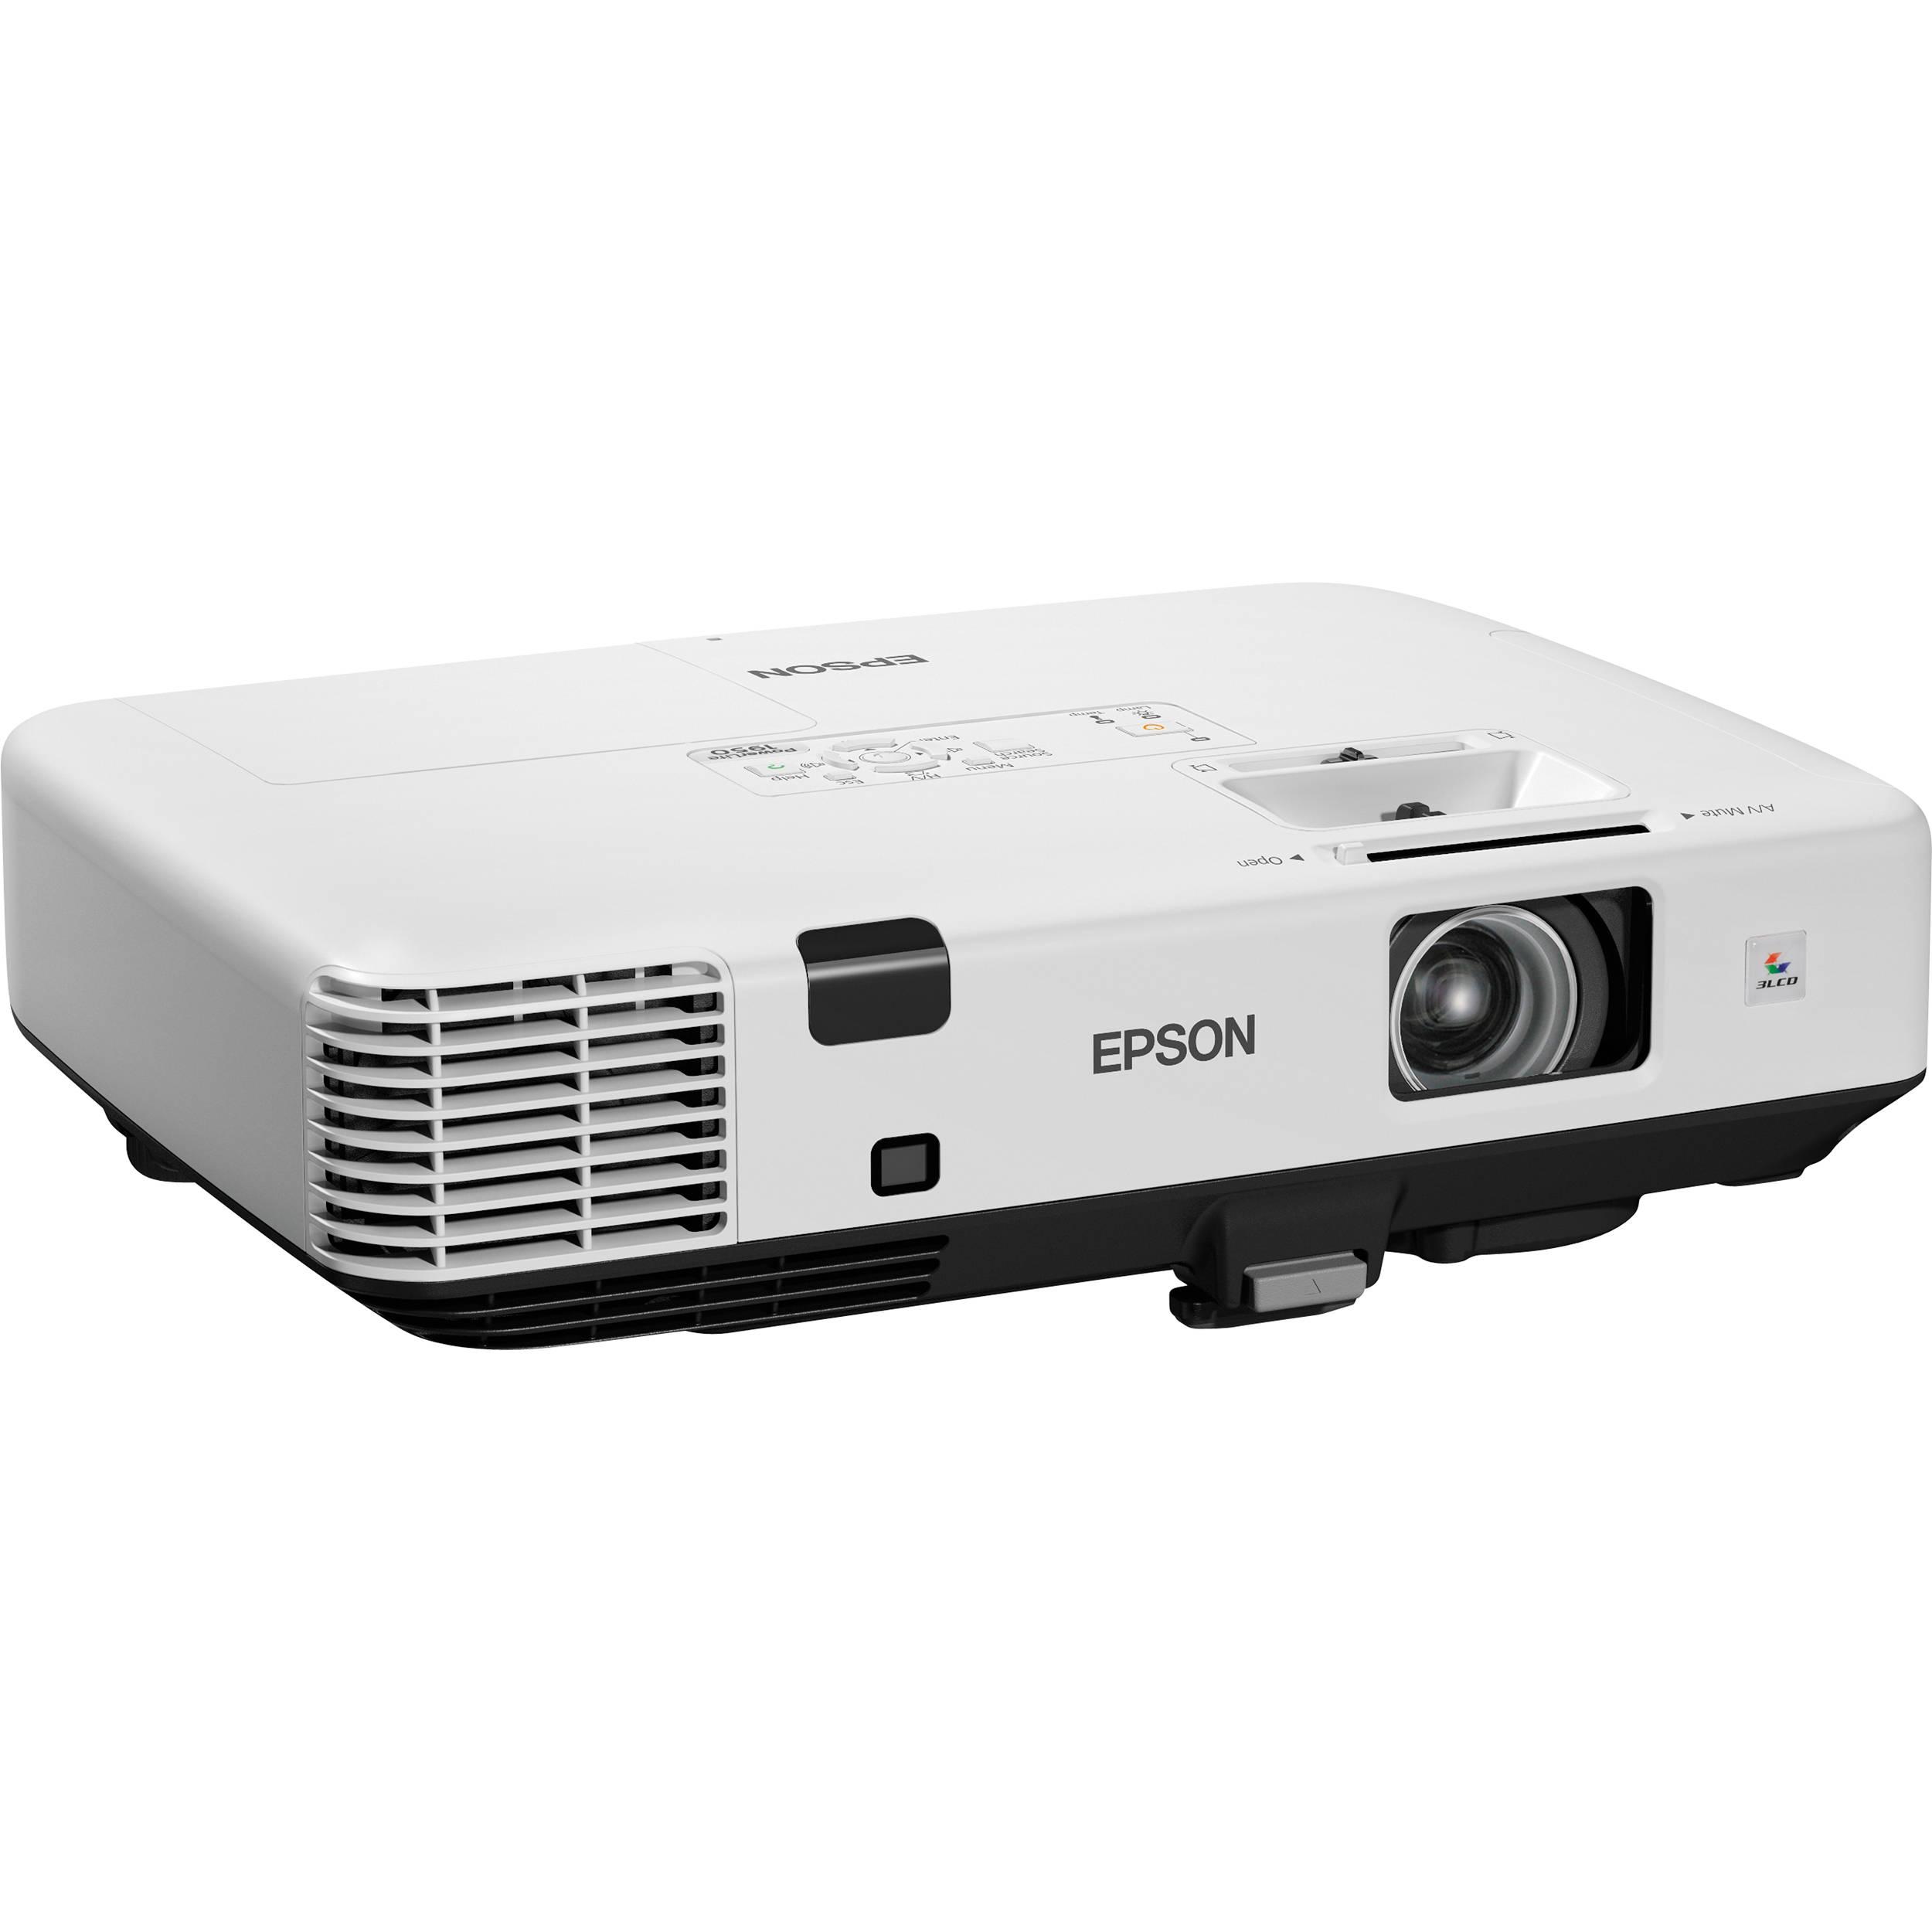 epson powerlite 1950 xga 3lcd projector v11h491020 b h photo epson lcd projector emp-83h manual epson lcd projector emp s5 manual